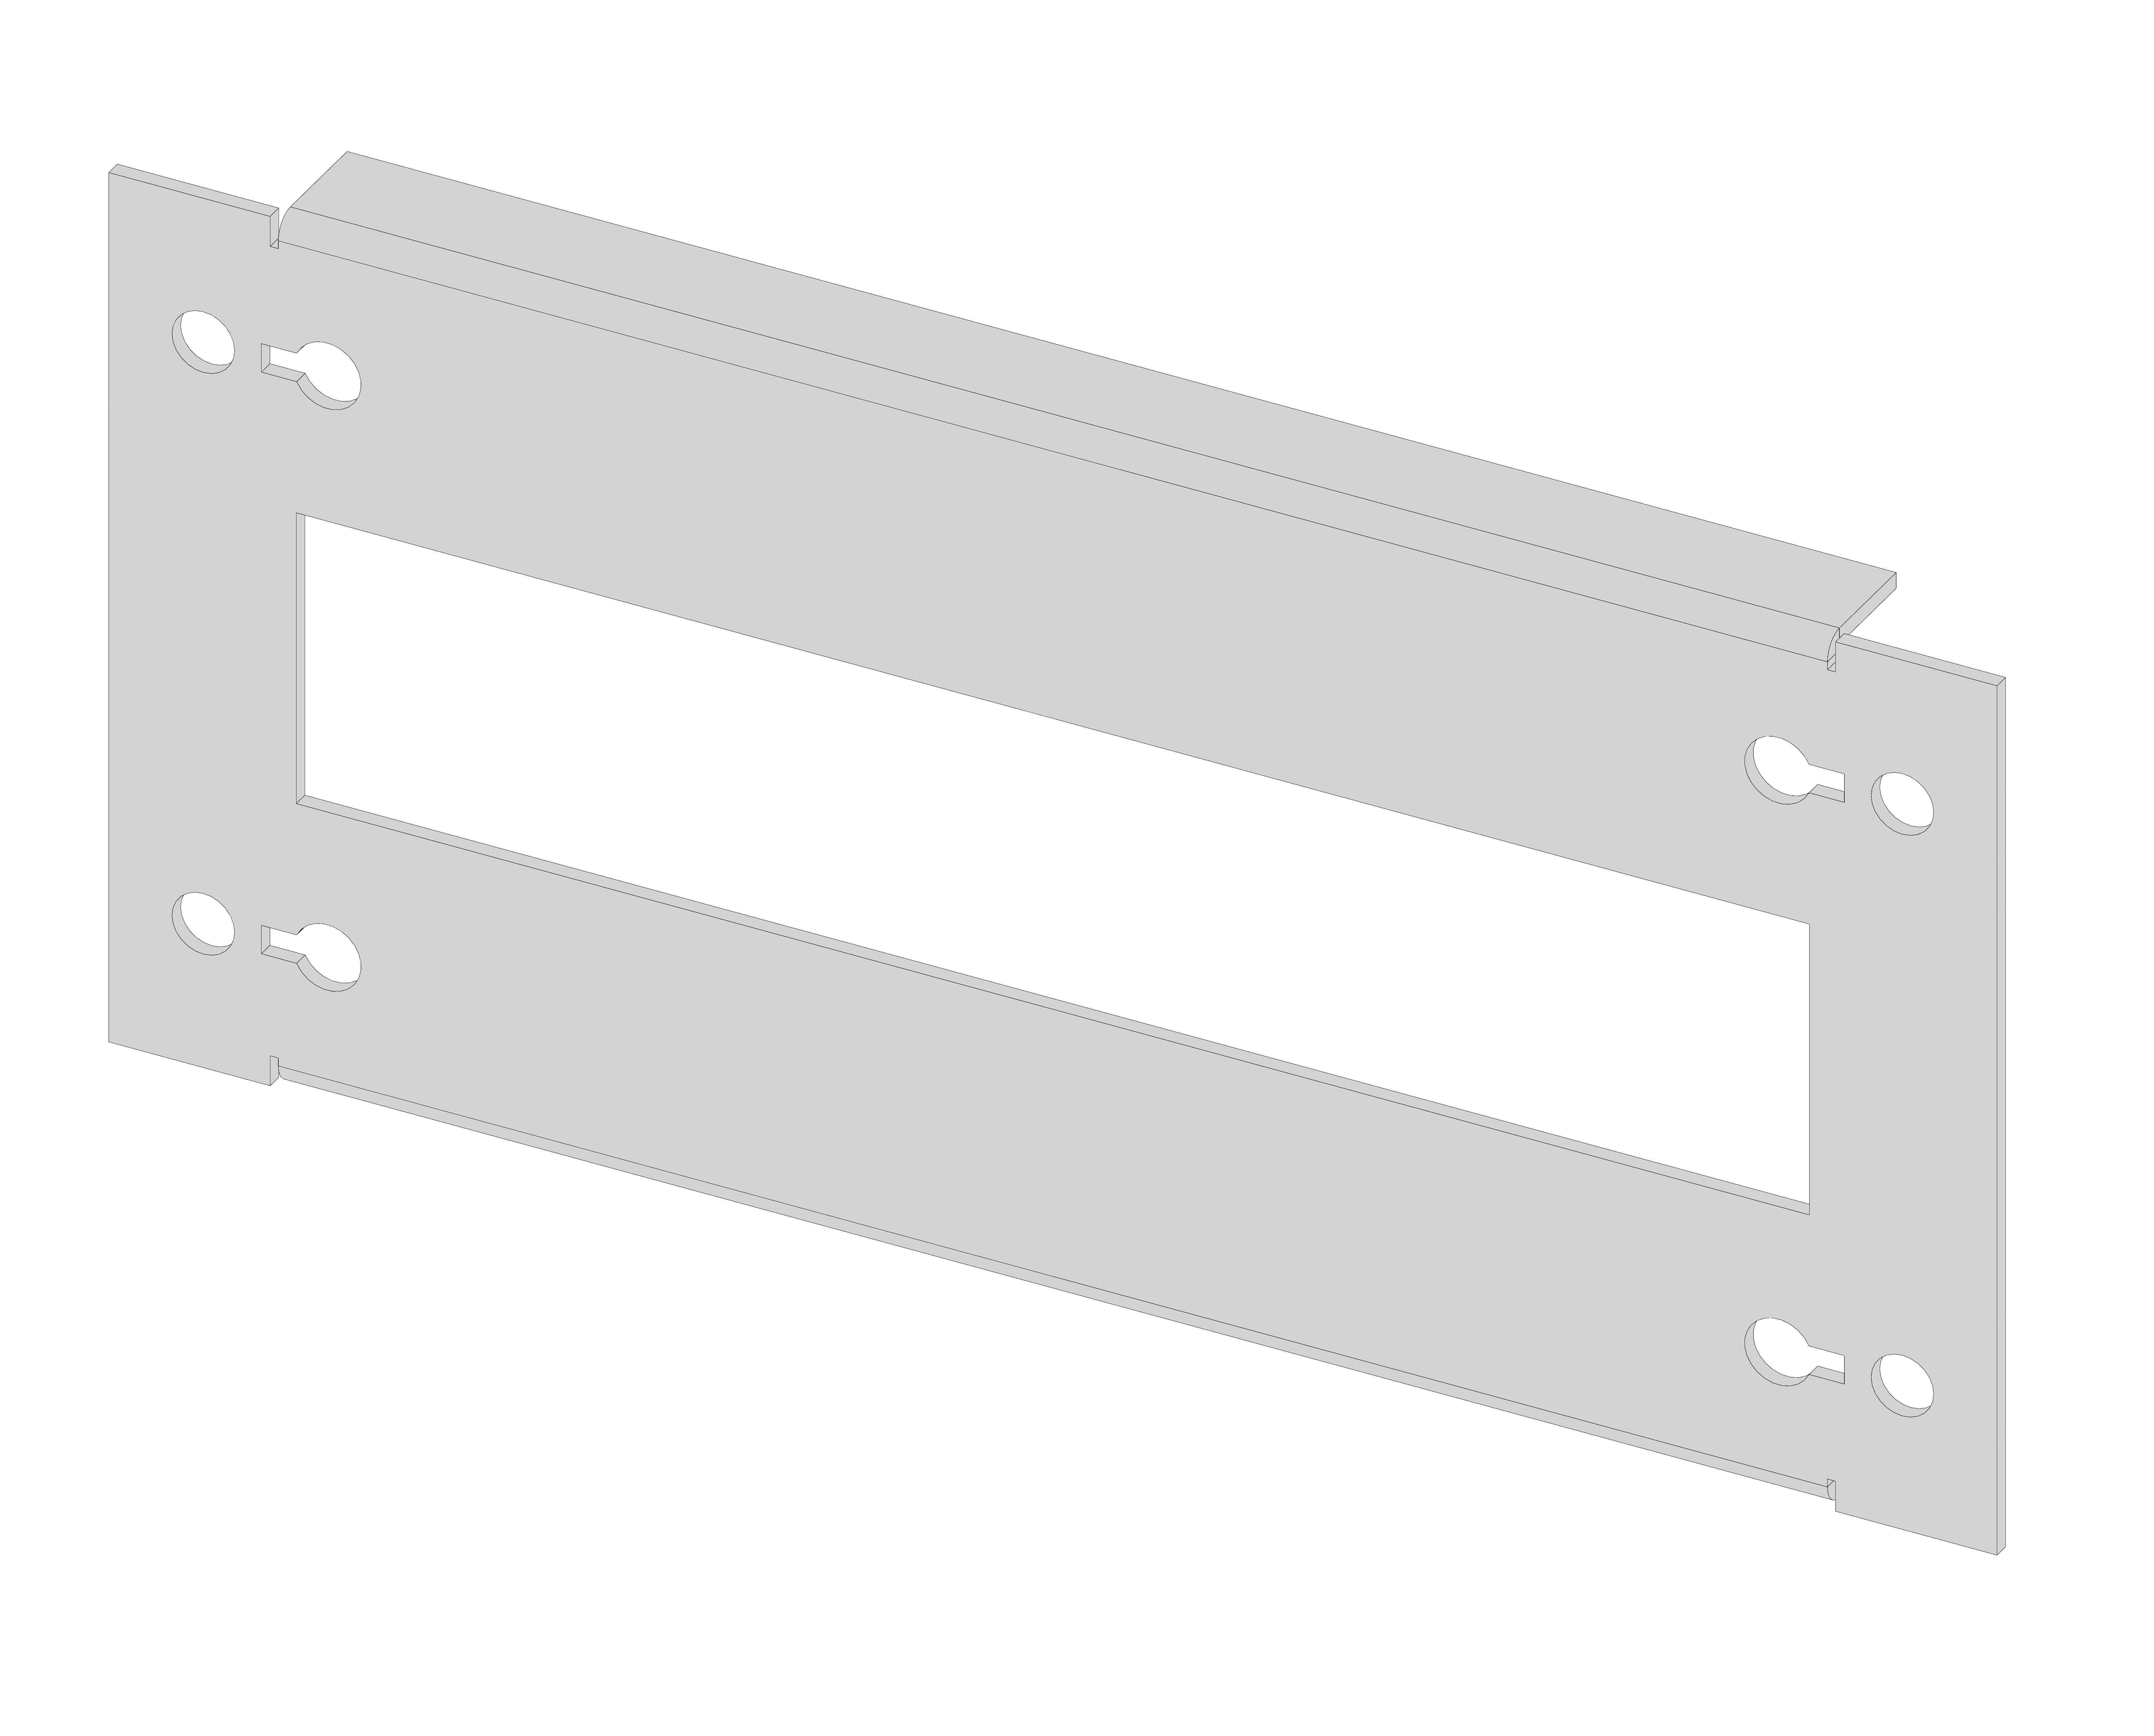 1 Stk Gerätefrontplatte 1G3K-L Kunststoff, langer Ausschnitt IL061103-H